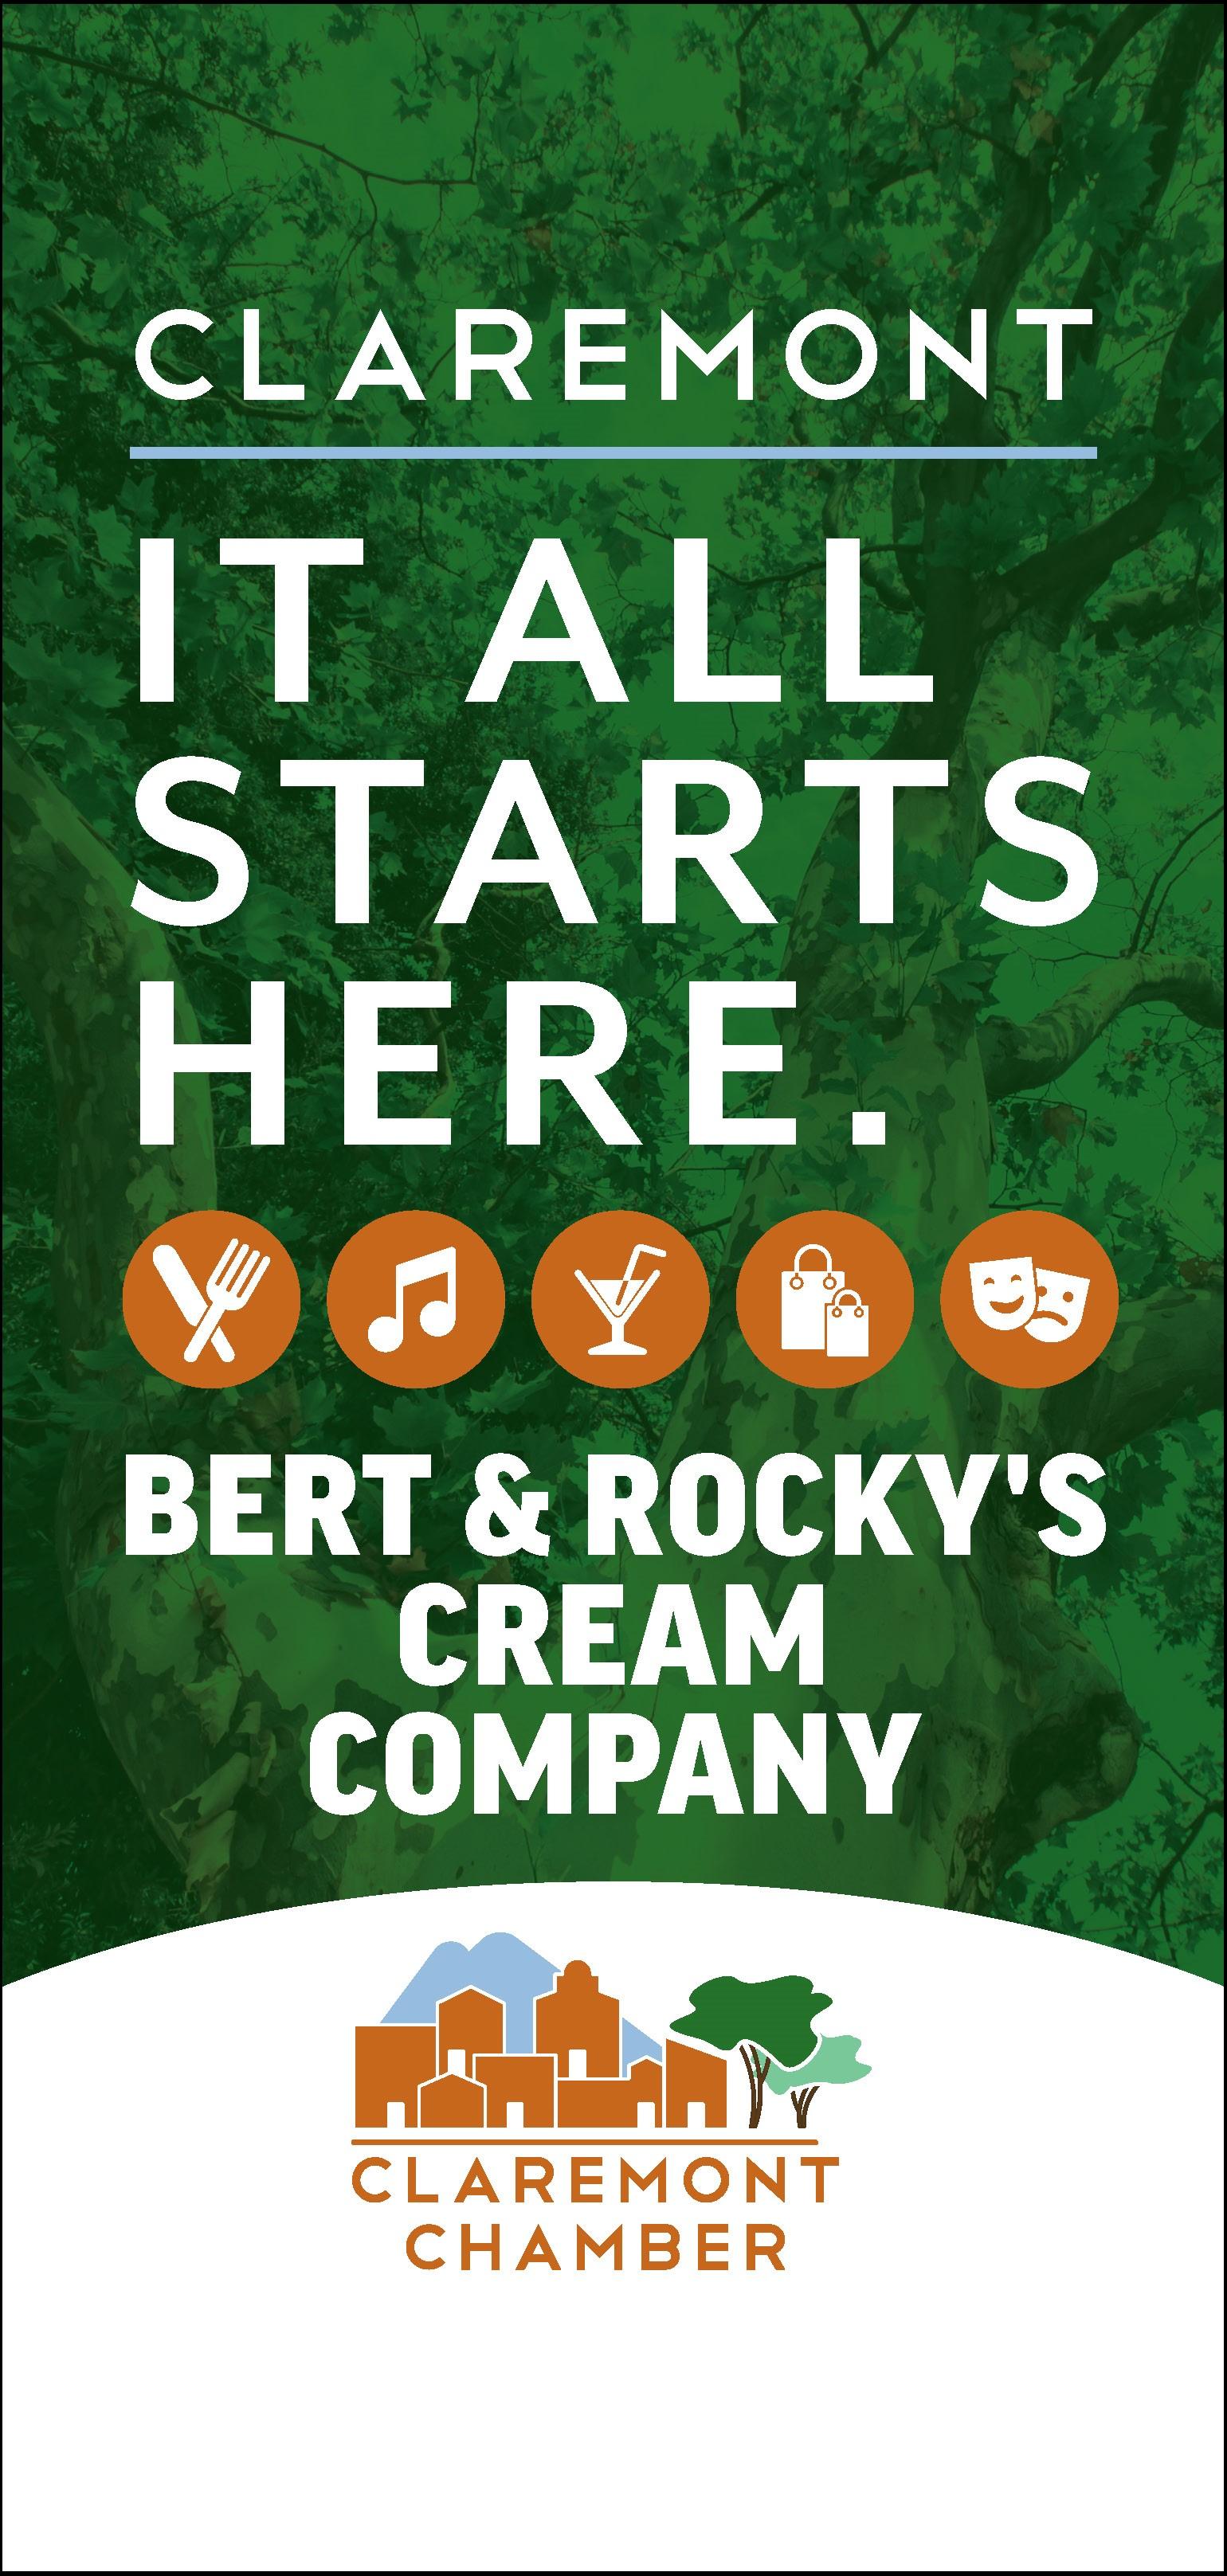 Bert & Rocky's Cream Company Banner